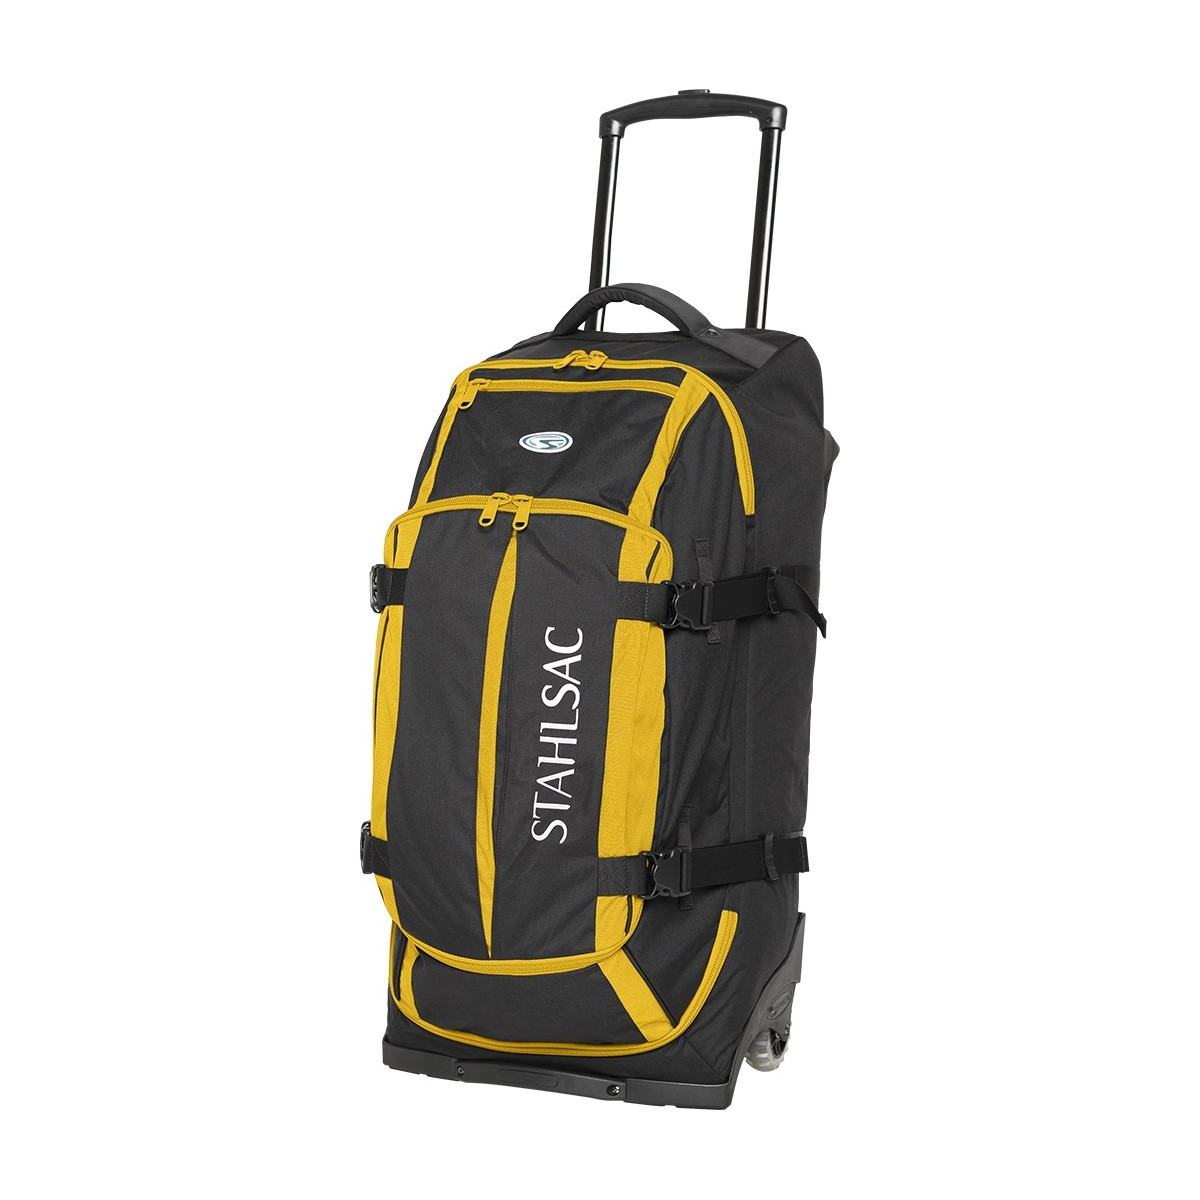 Stahlsac Curacao Clipper Travel Bag